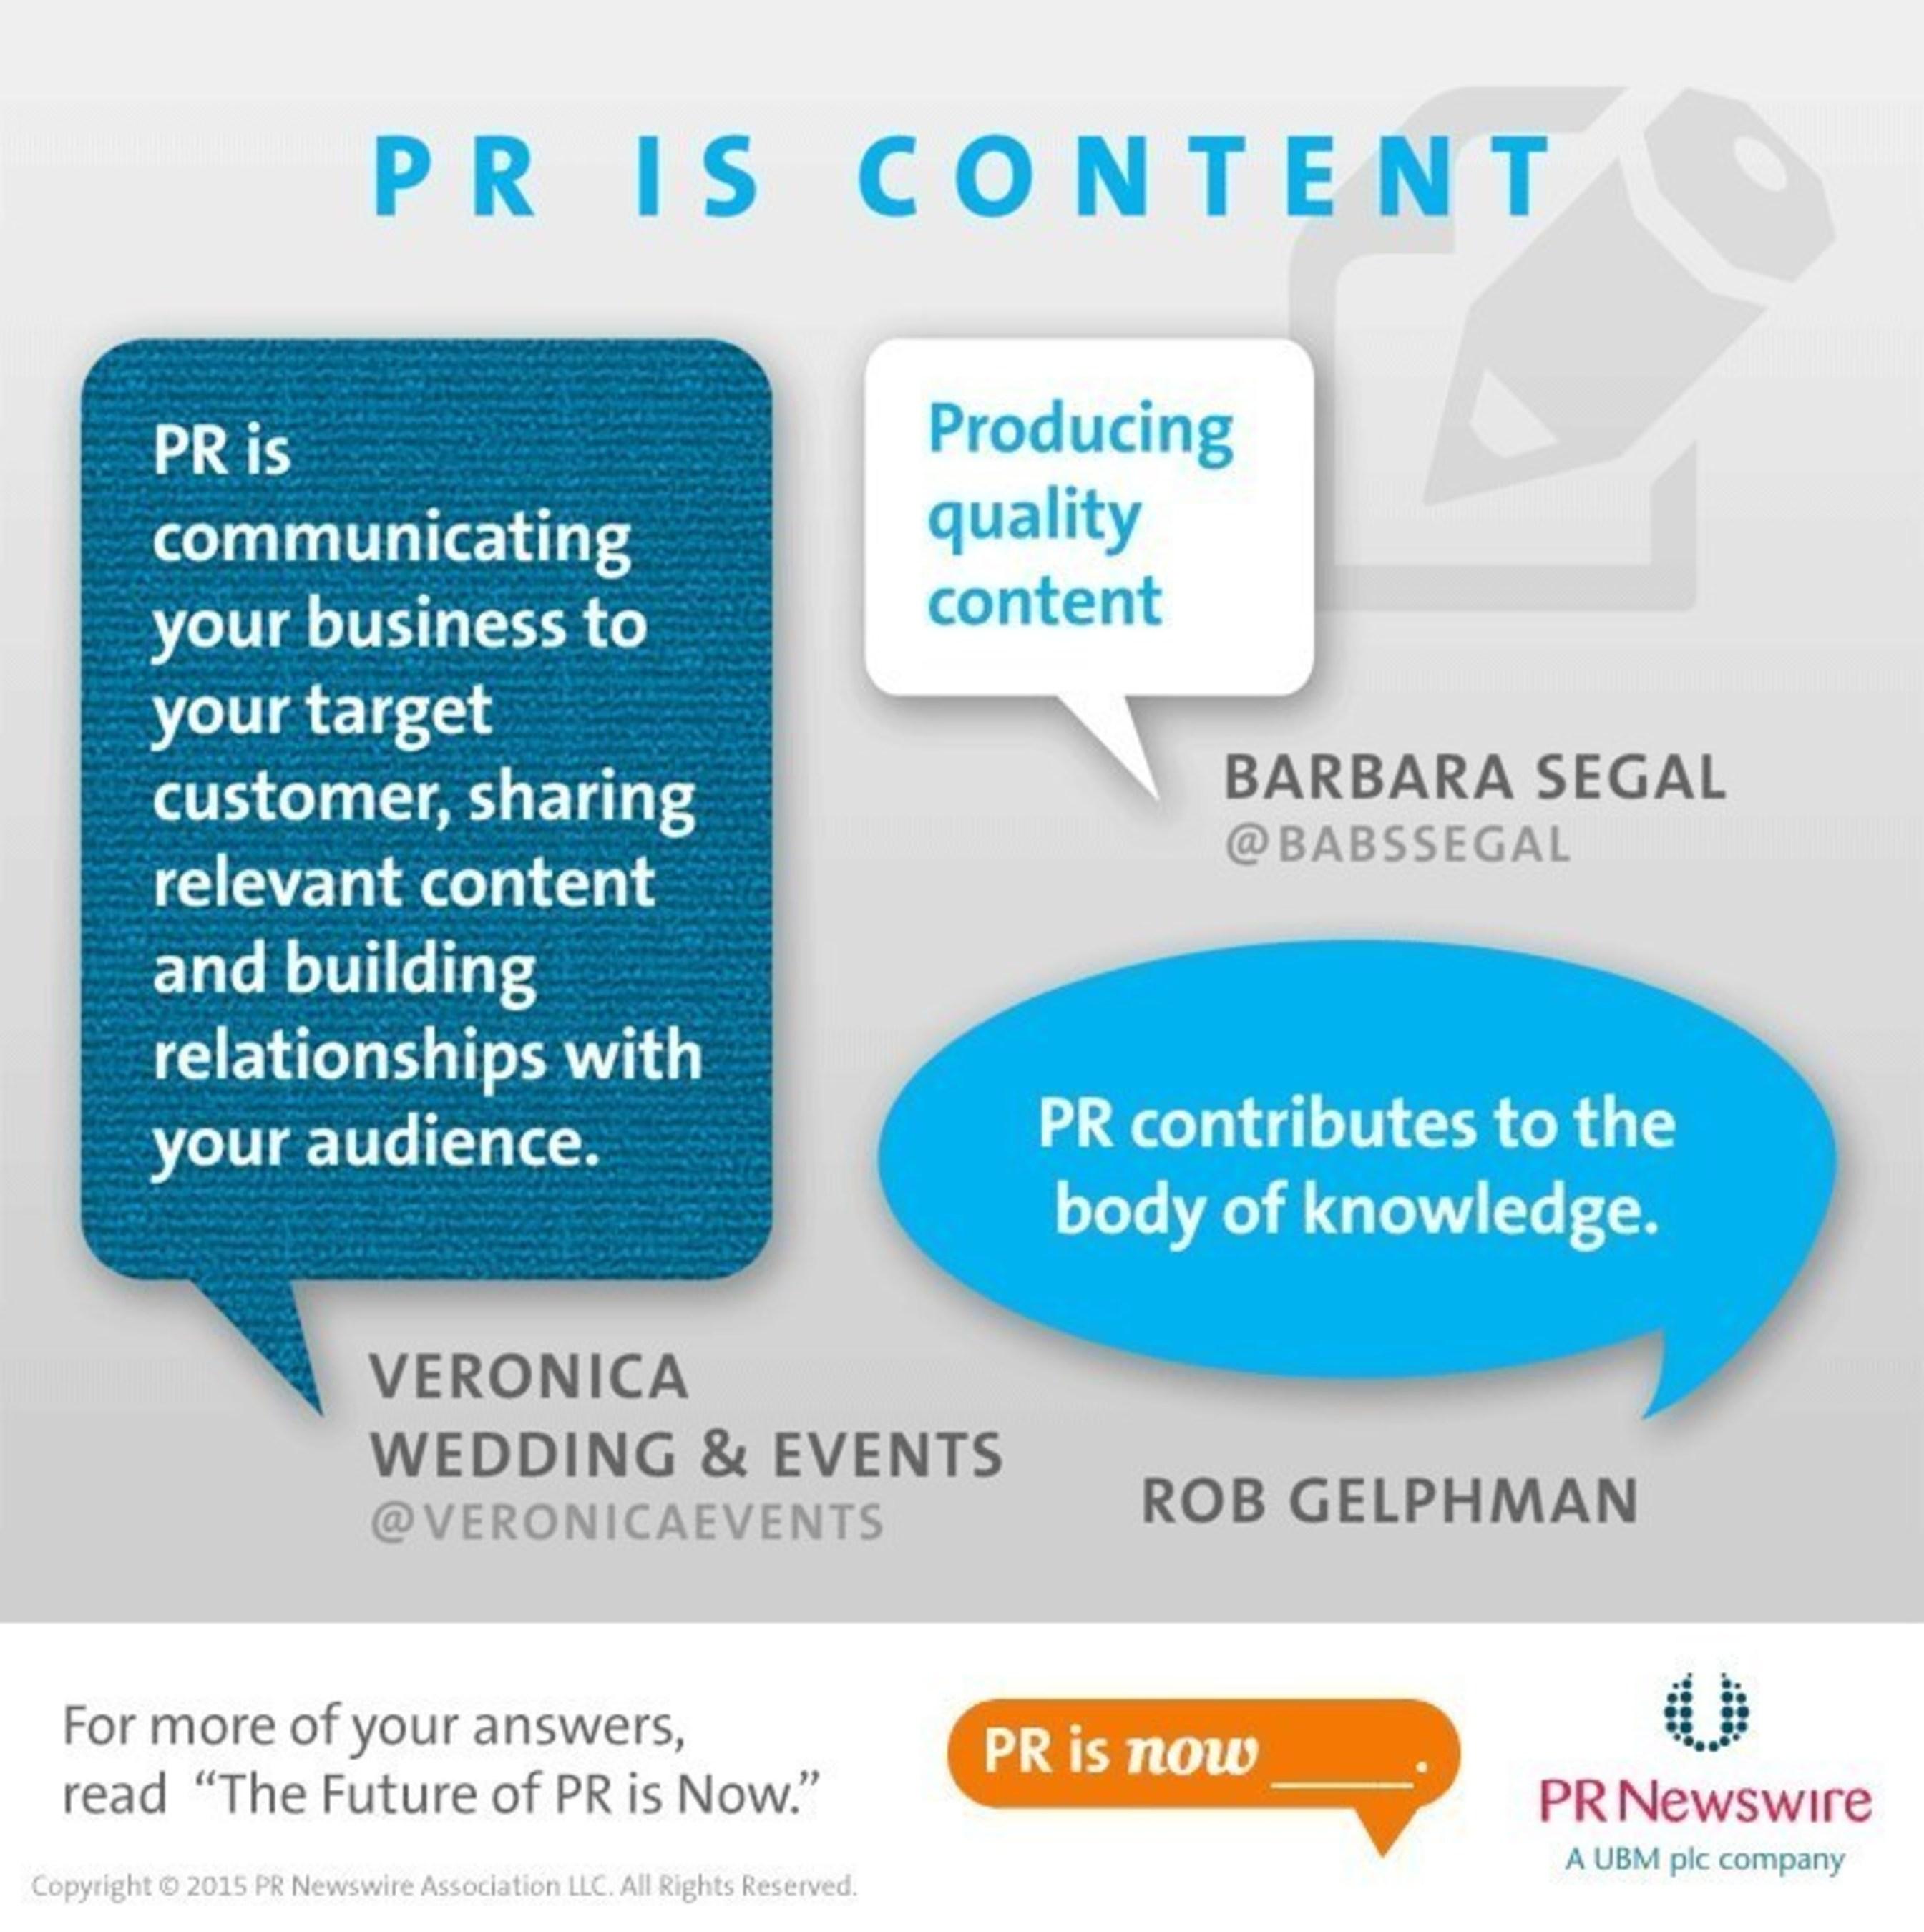 What do you think #PRisNow? Let us know @PRNewswire